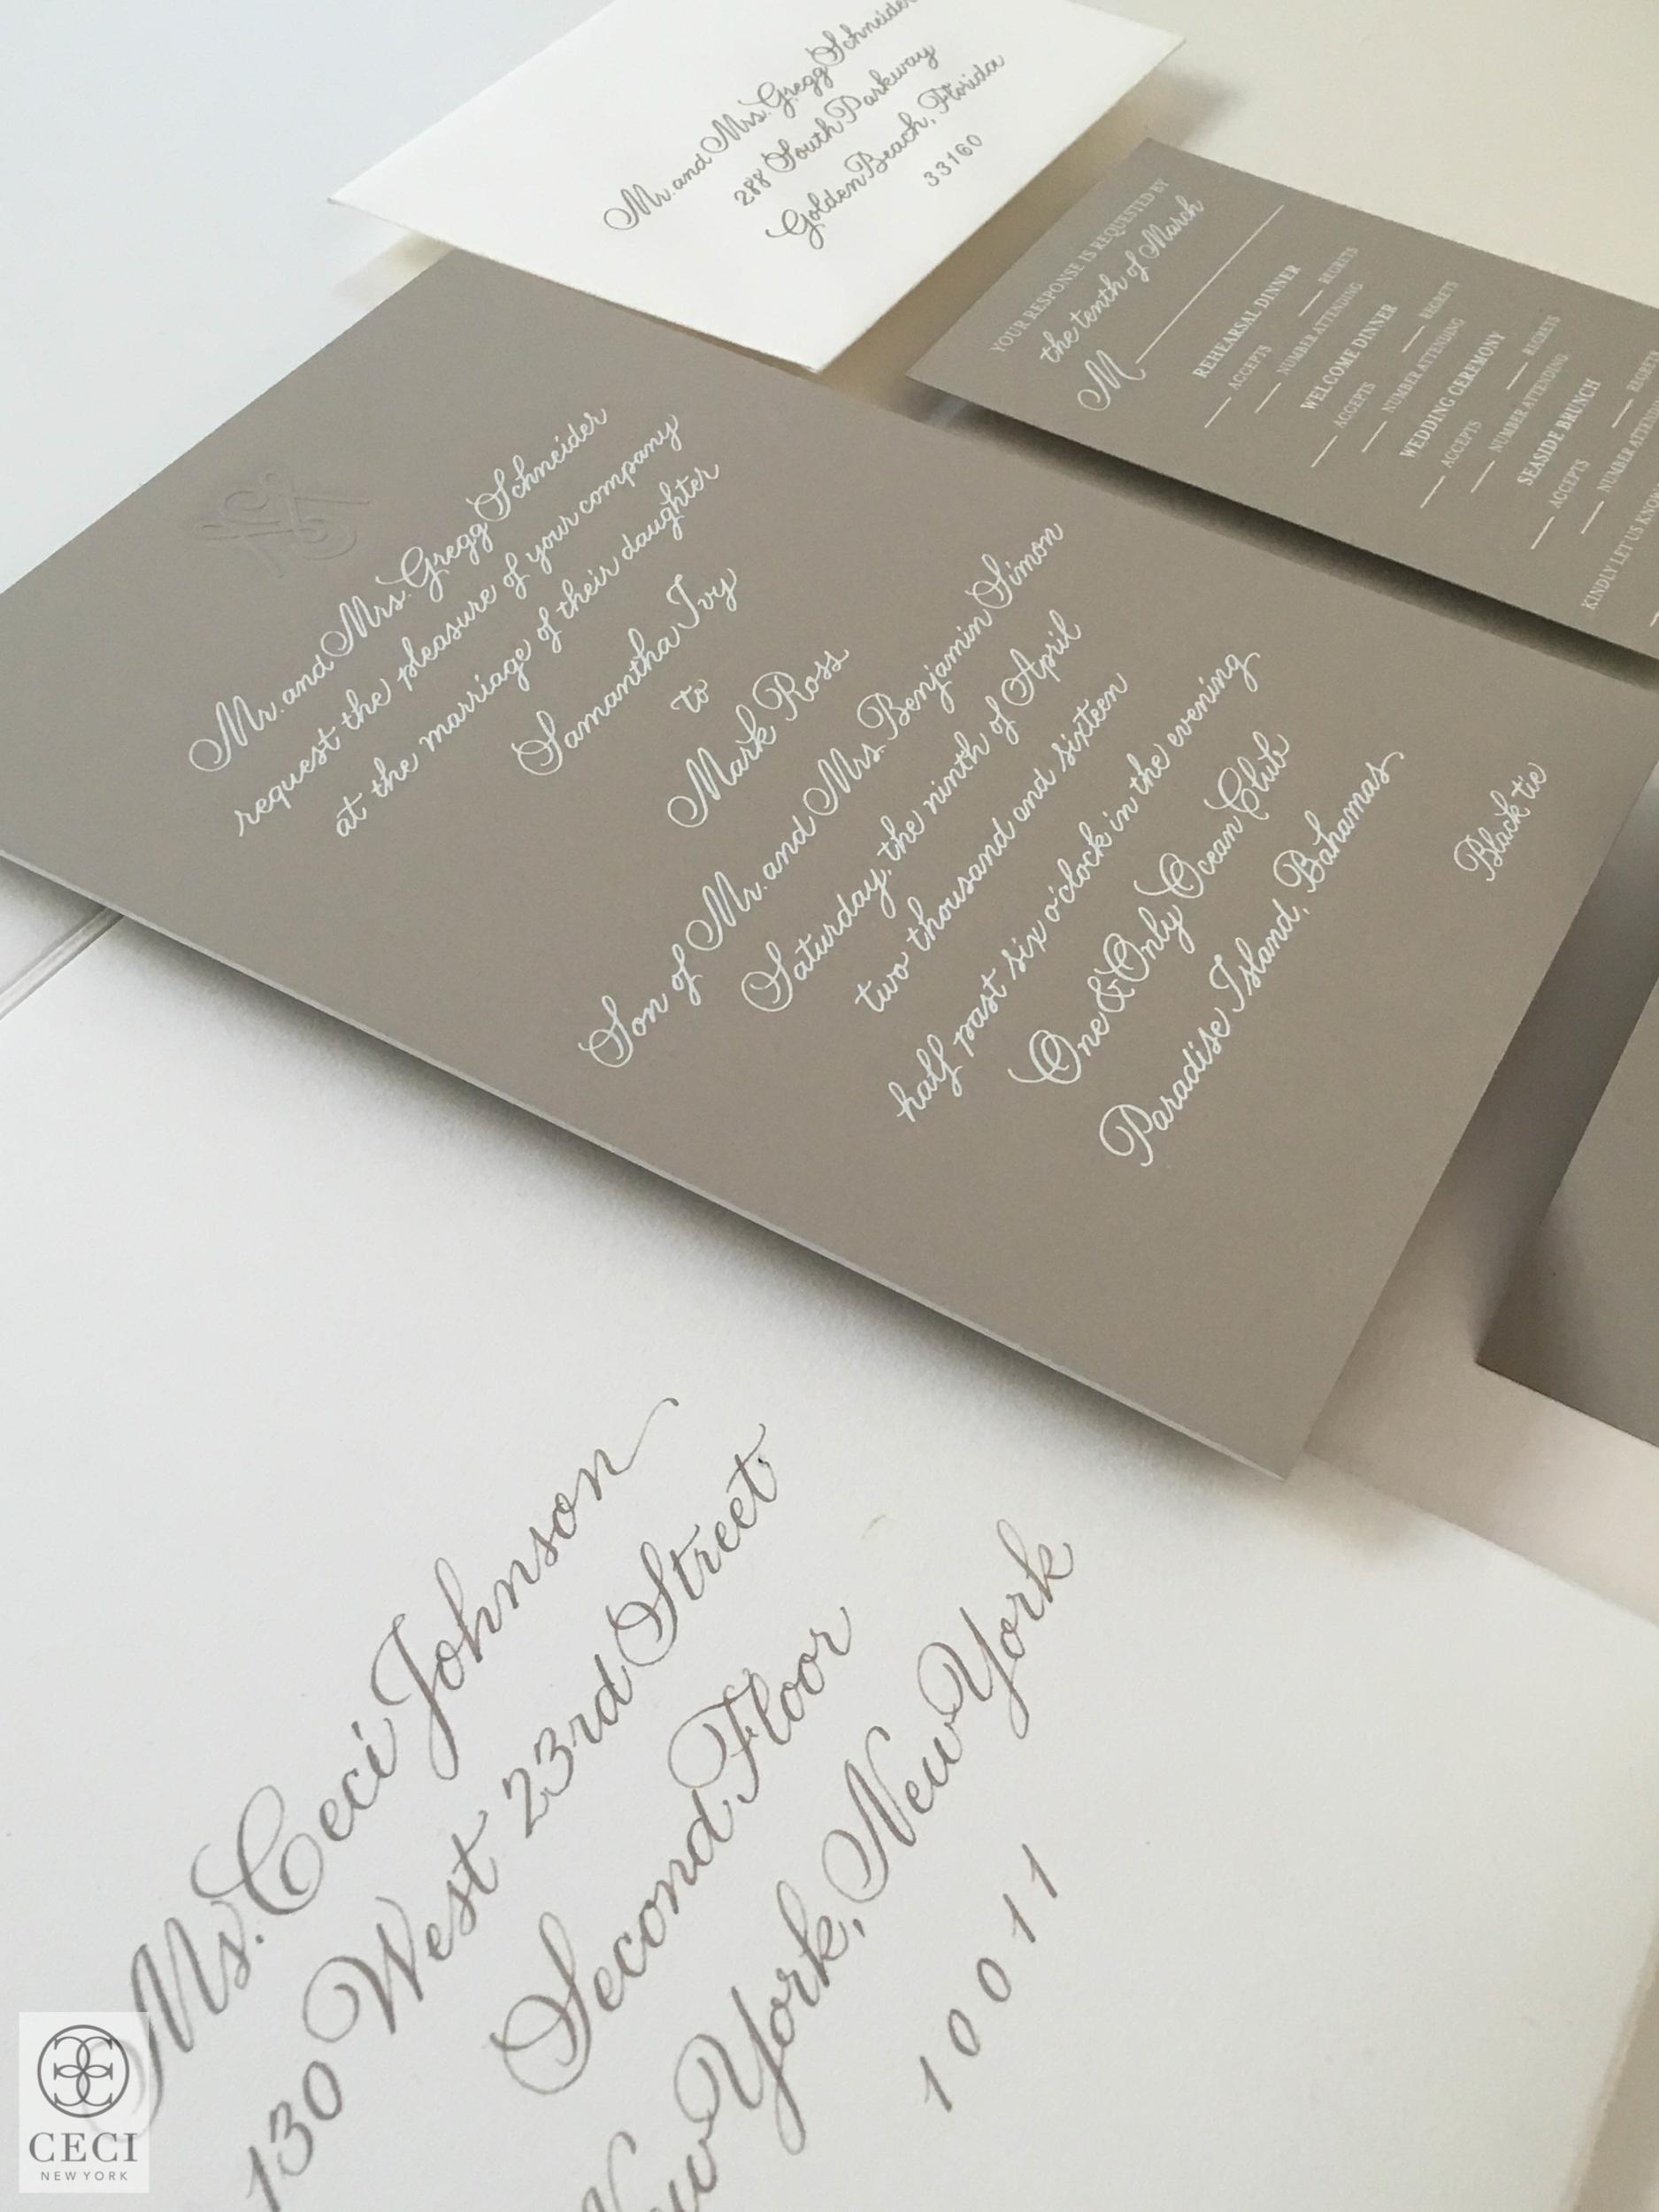 Ceci_New_York_Ceci_Style_Ceci_Johnson_Luxury_Lifestyle_Paradise_Island_Bahamas_Wedding_Engraved_Inspiration_Design_Custom_Couture_Personalized_Invitations_--5.jpg